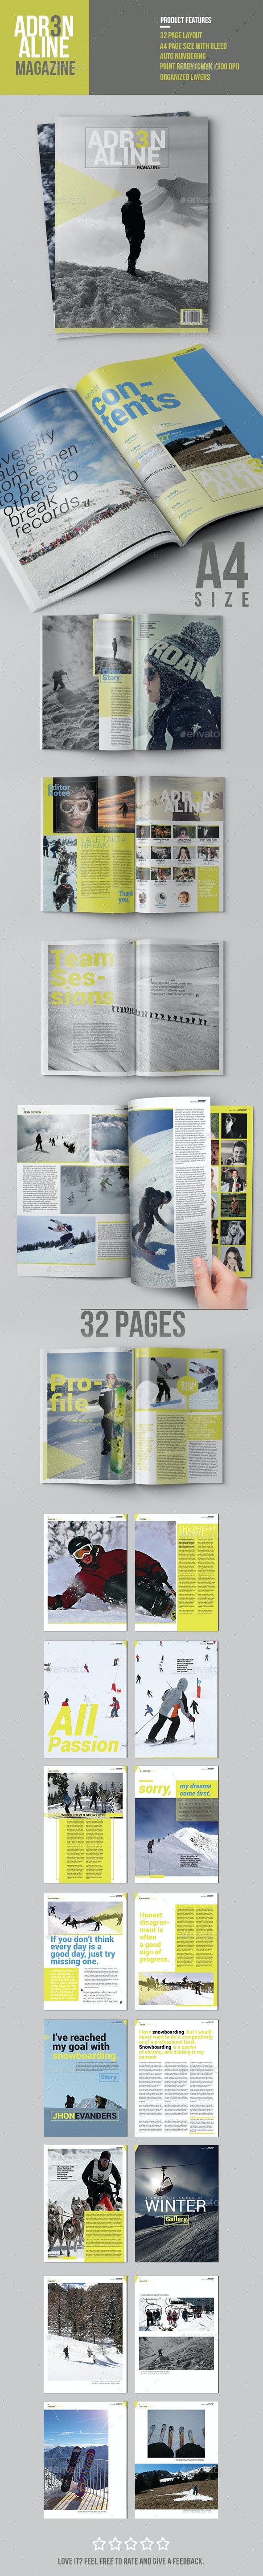 Adrenaline Magazine Template - Magazines Print Templates